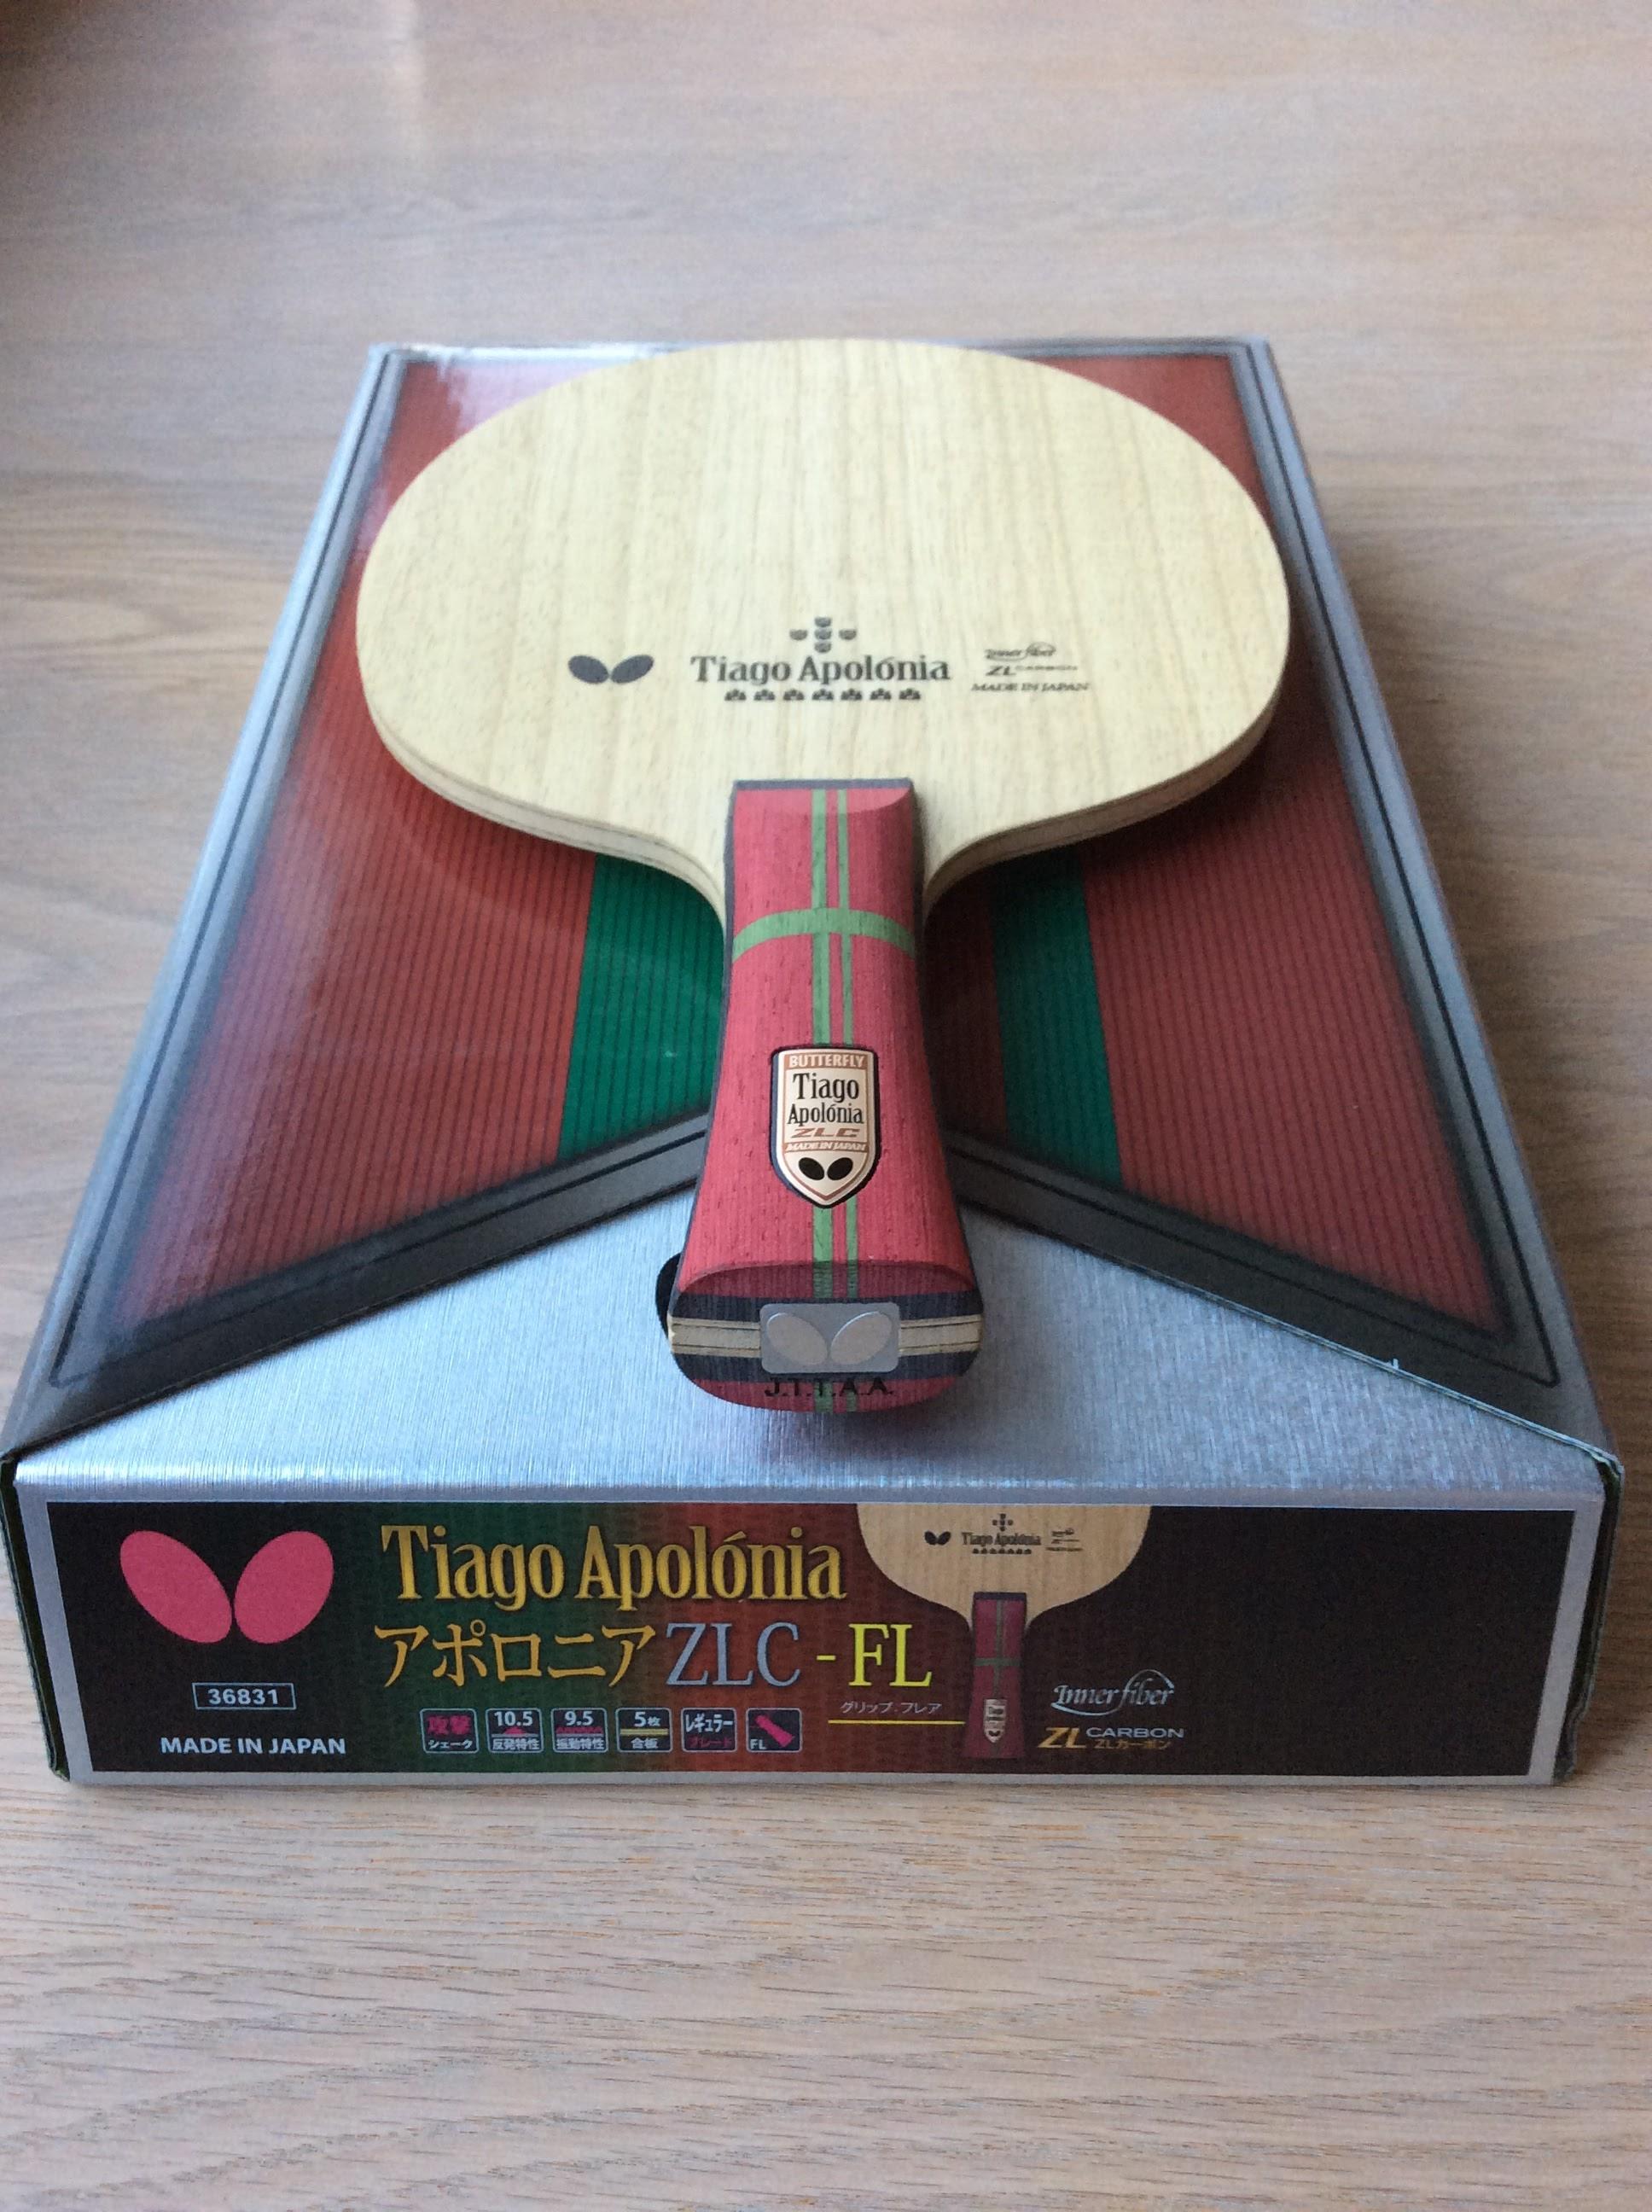 Butterfly Apolonia Zlc Reviews